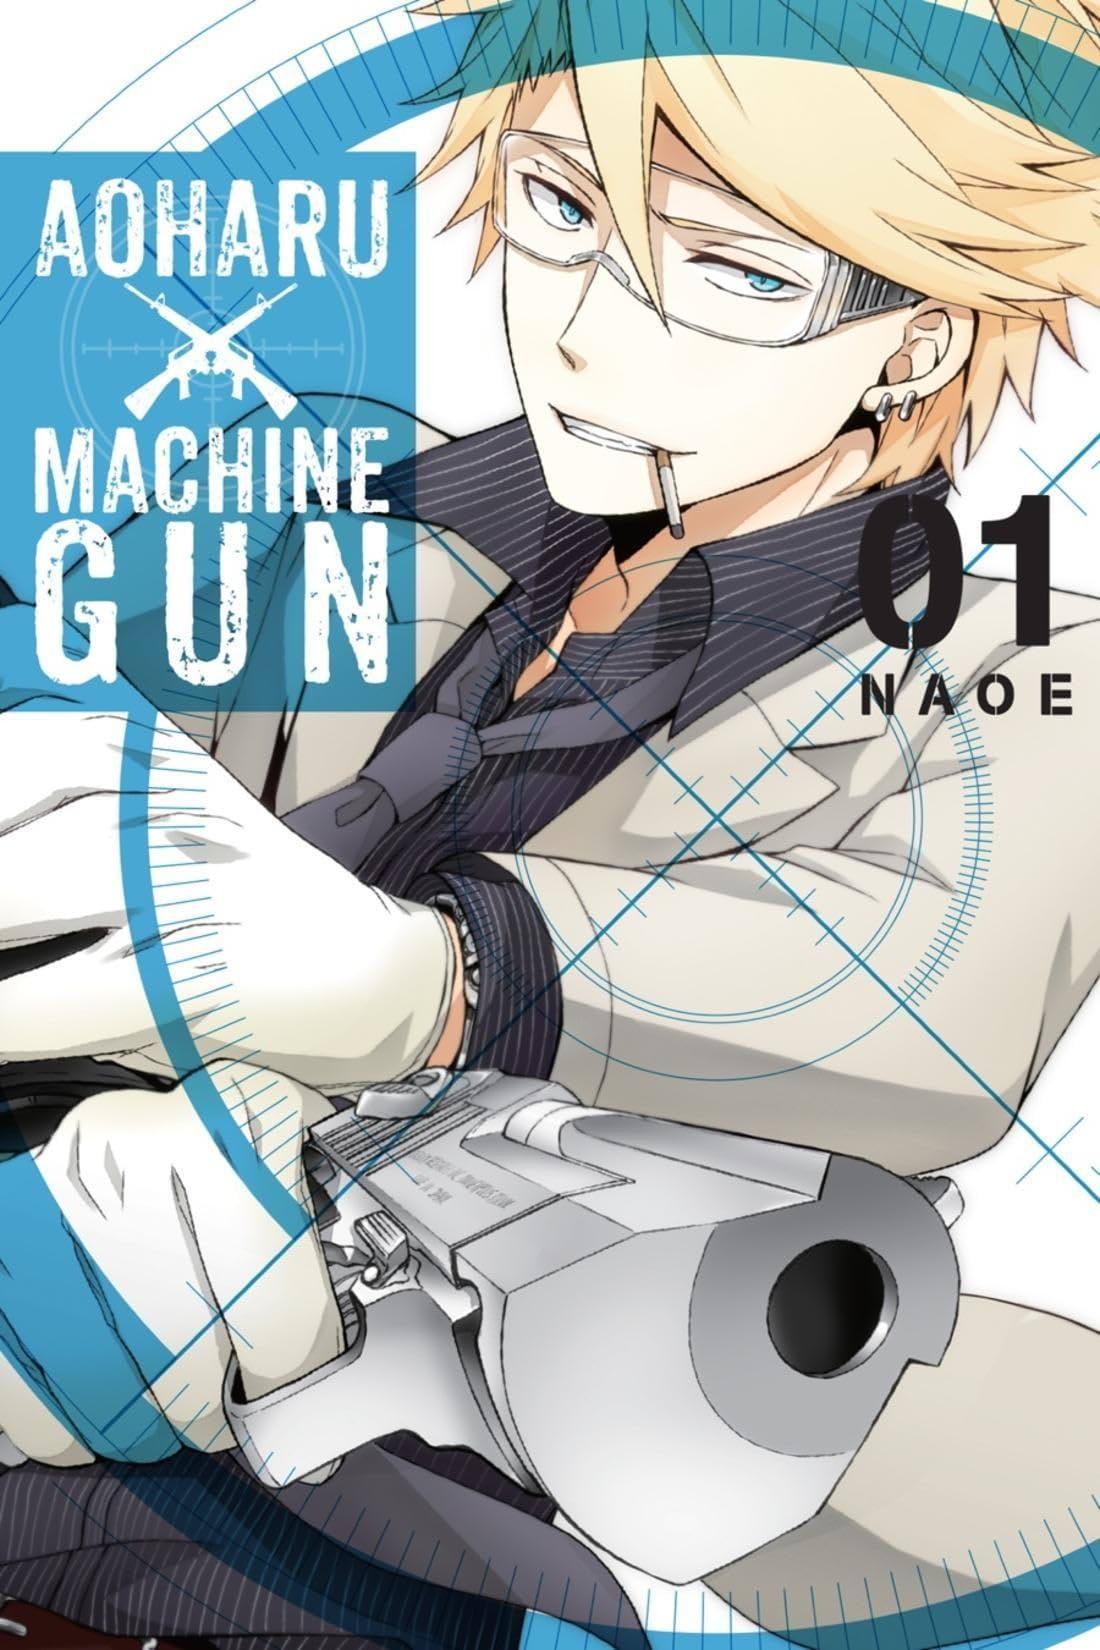 Aoharu X Machinegun Vol. 1